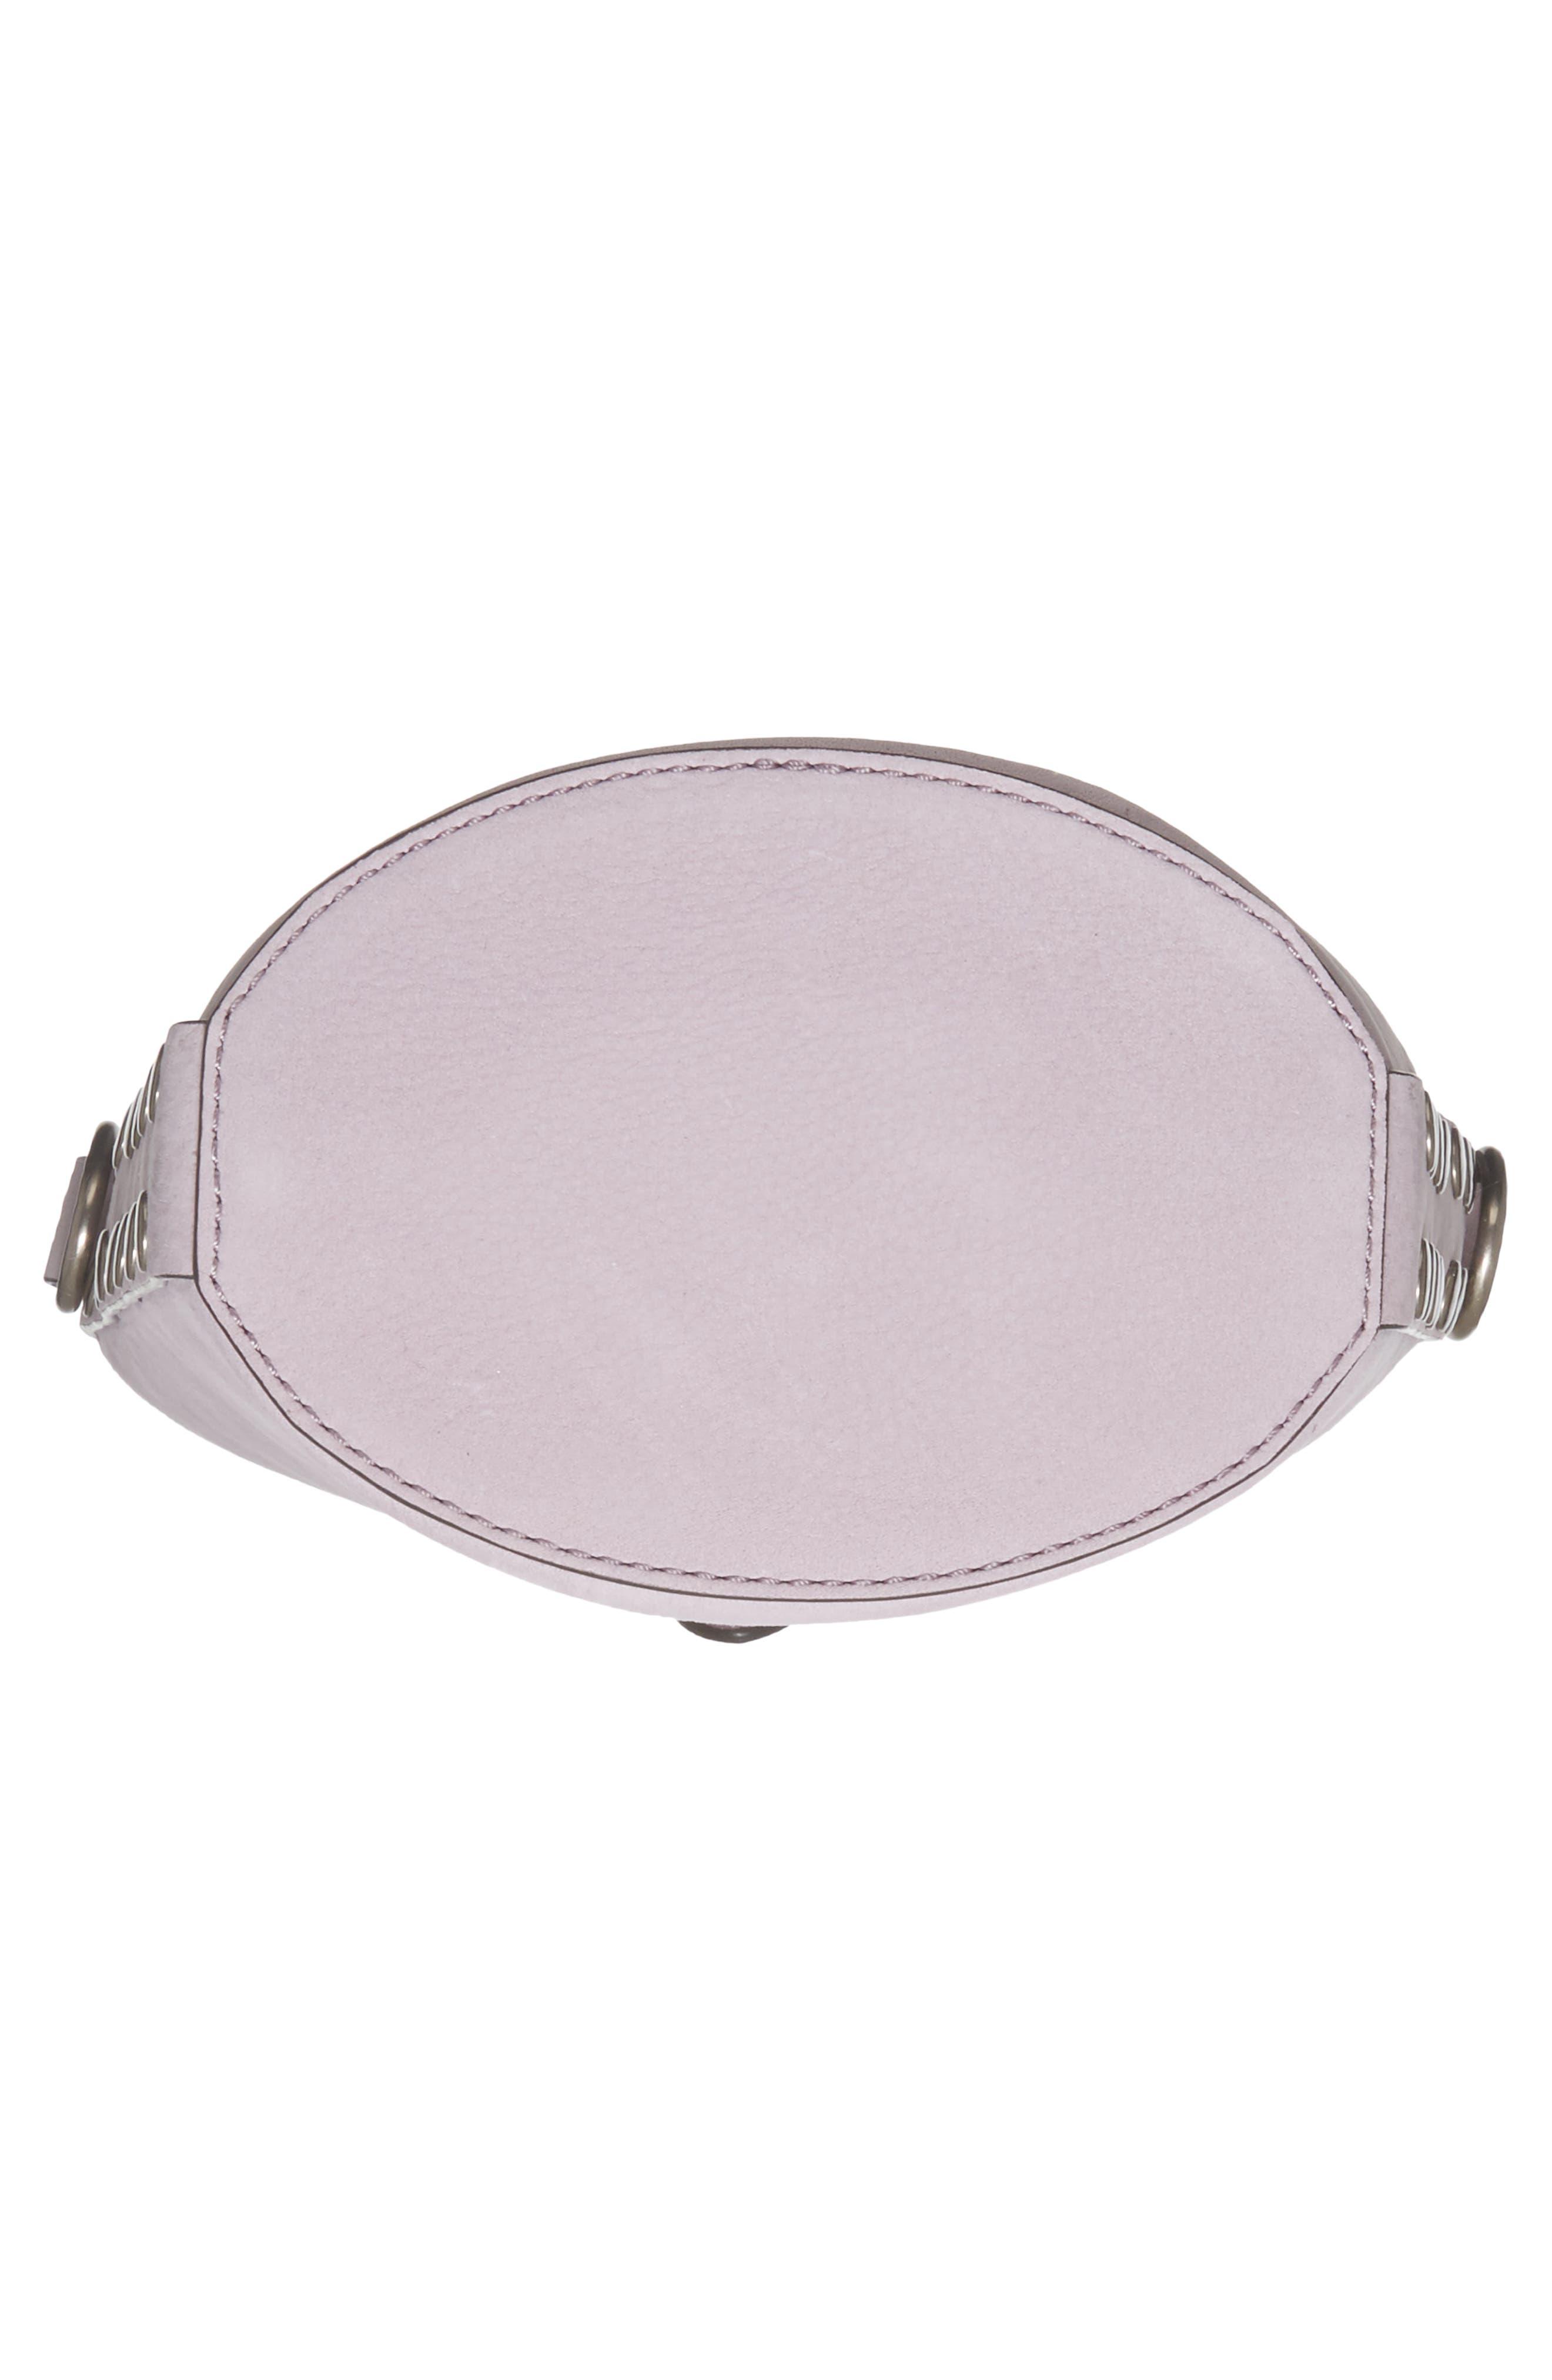 Slim Leather Bucket Bag,                             Alternate thumbnail 7, color,                             533